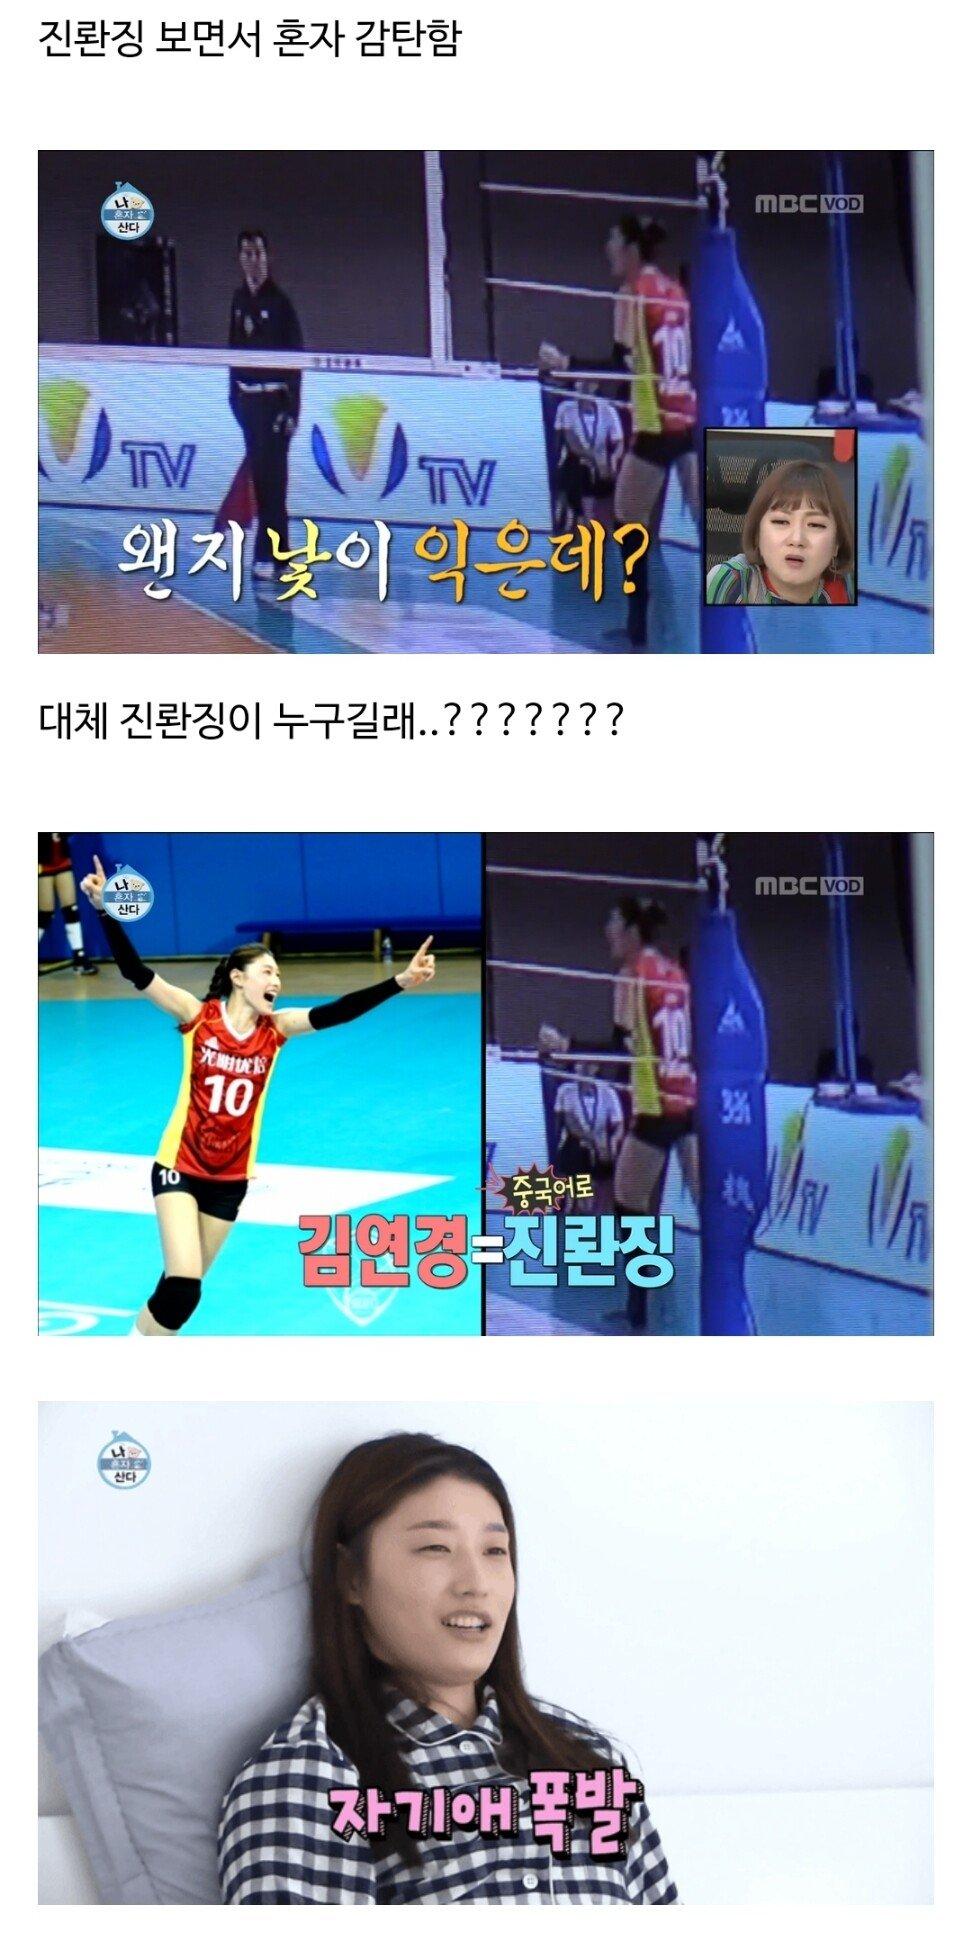 3.jpg 배구선수 진롼징을 보며 감탄하는 김연경.jpg